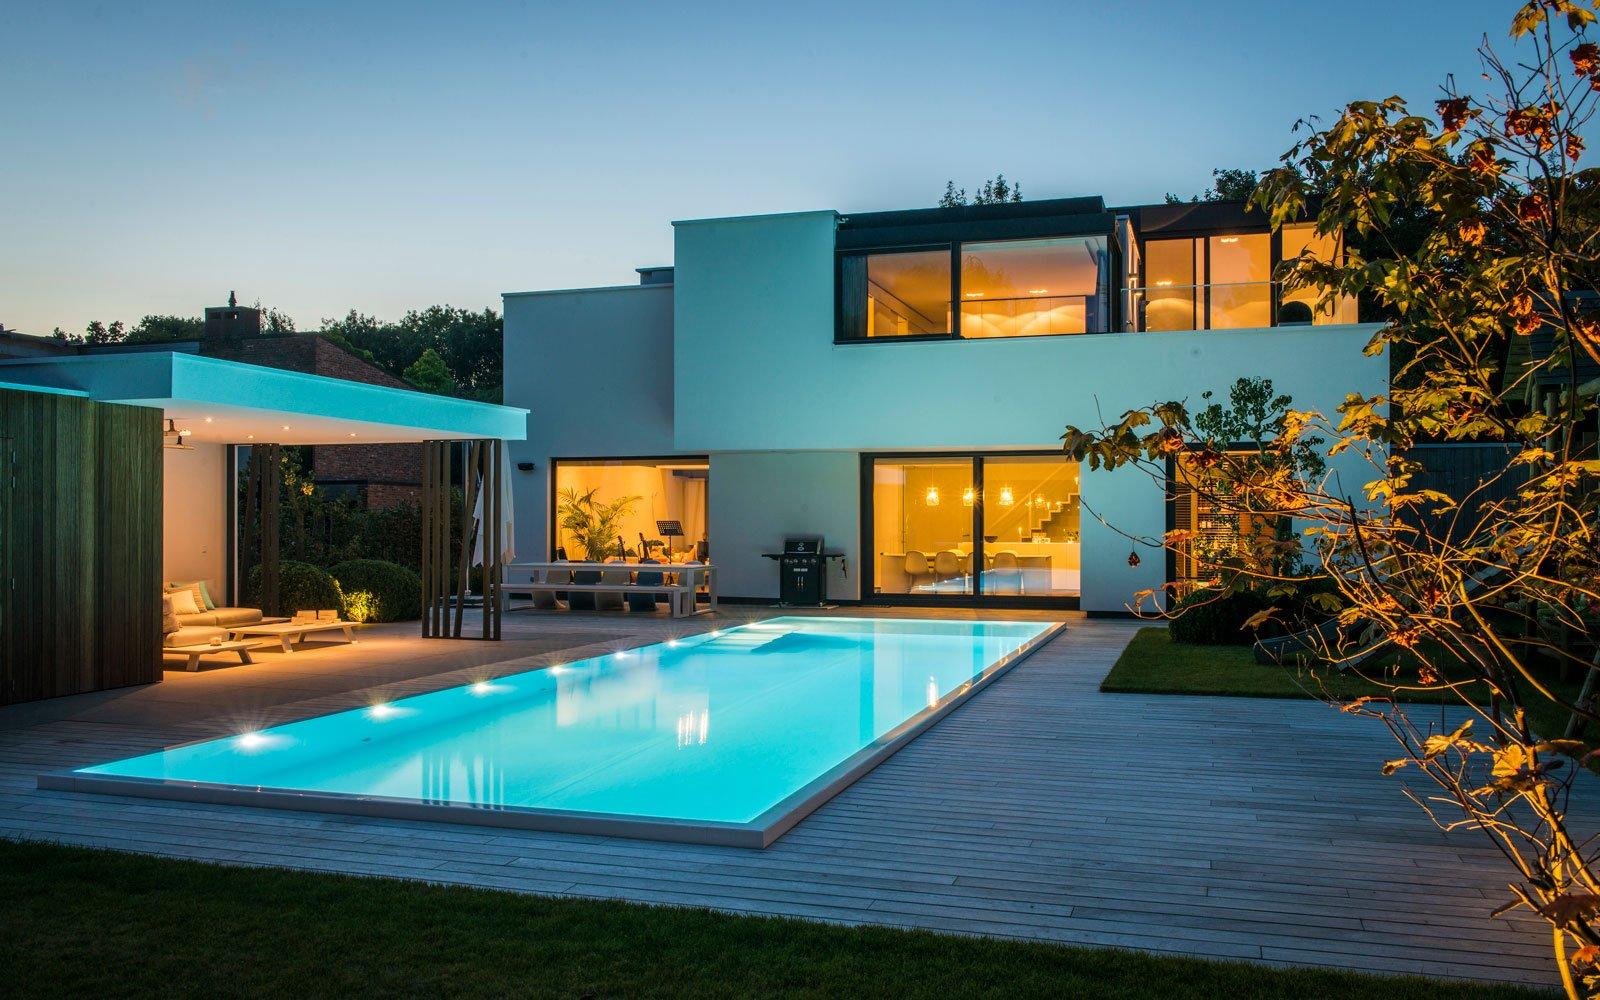 Zwembad tuin t groene plan the art of living be